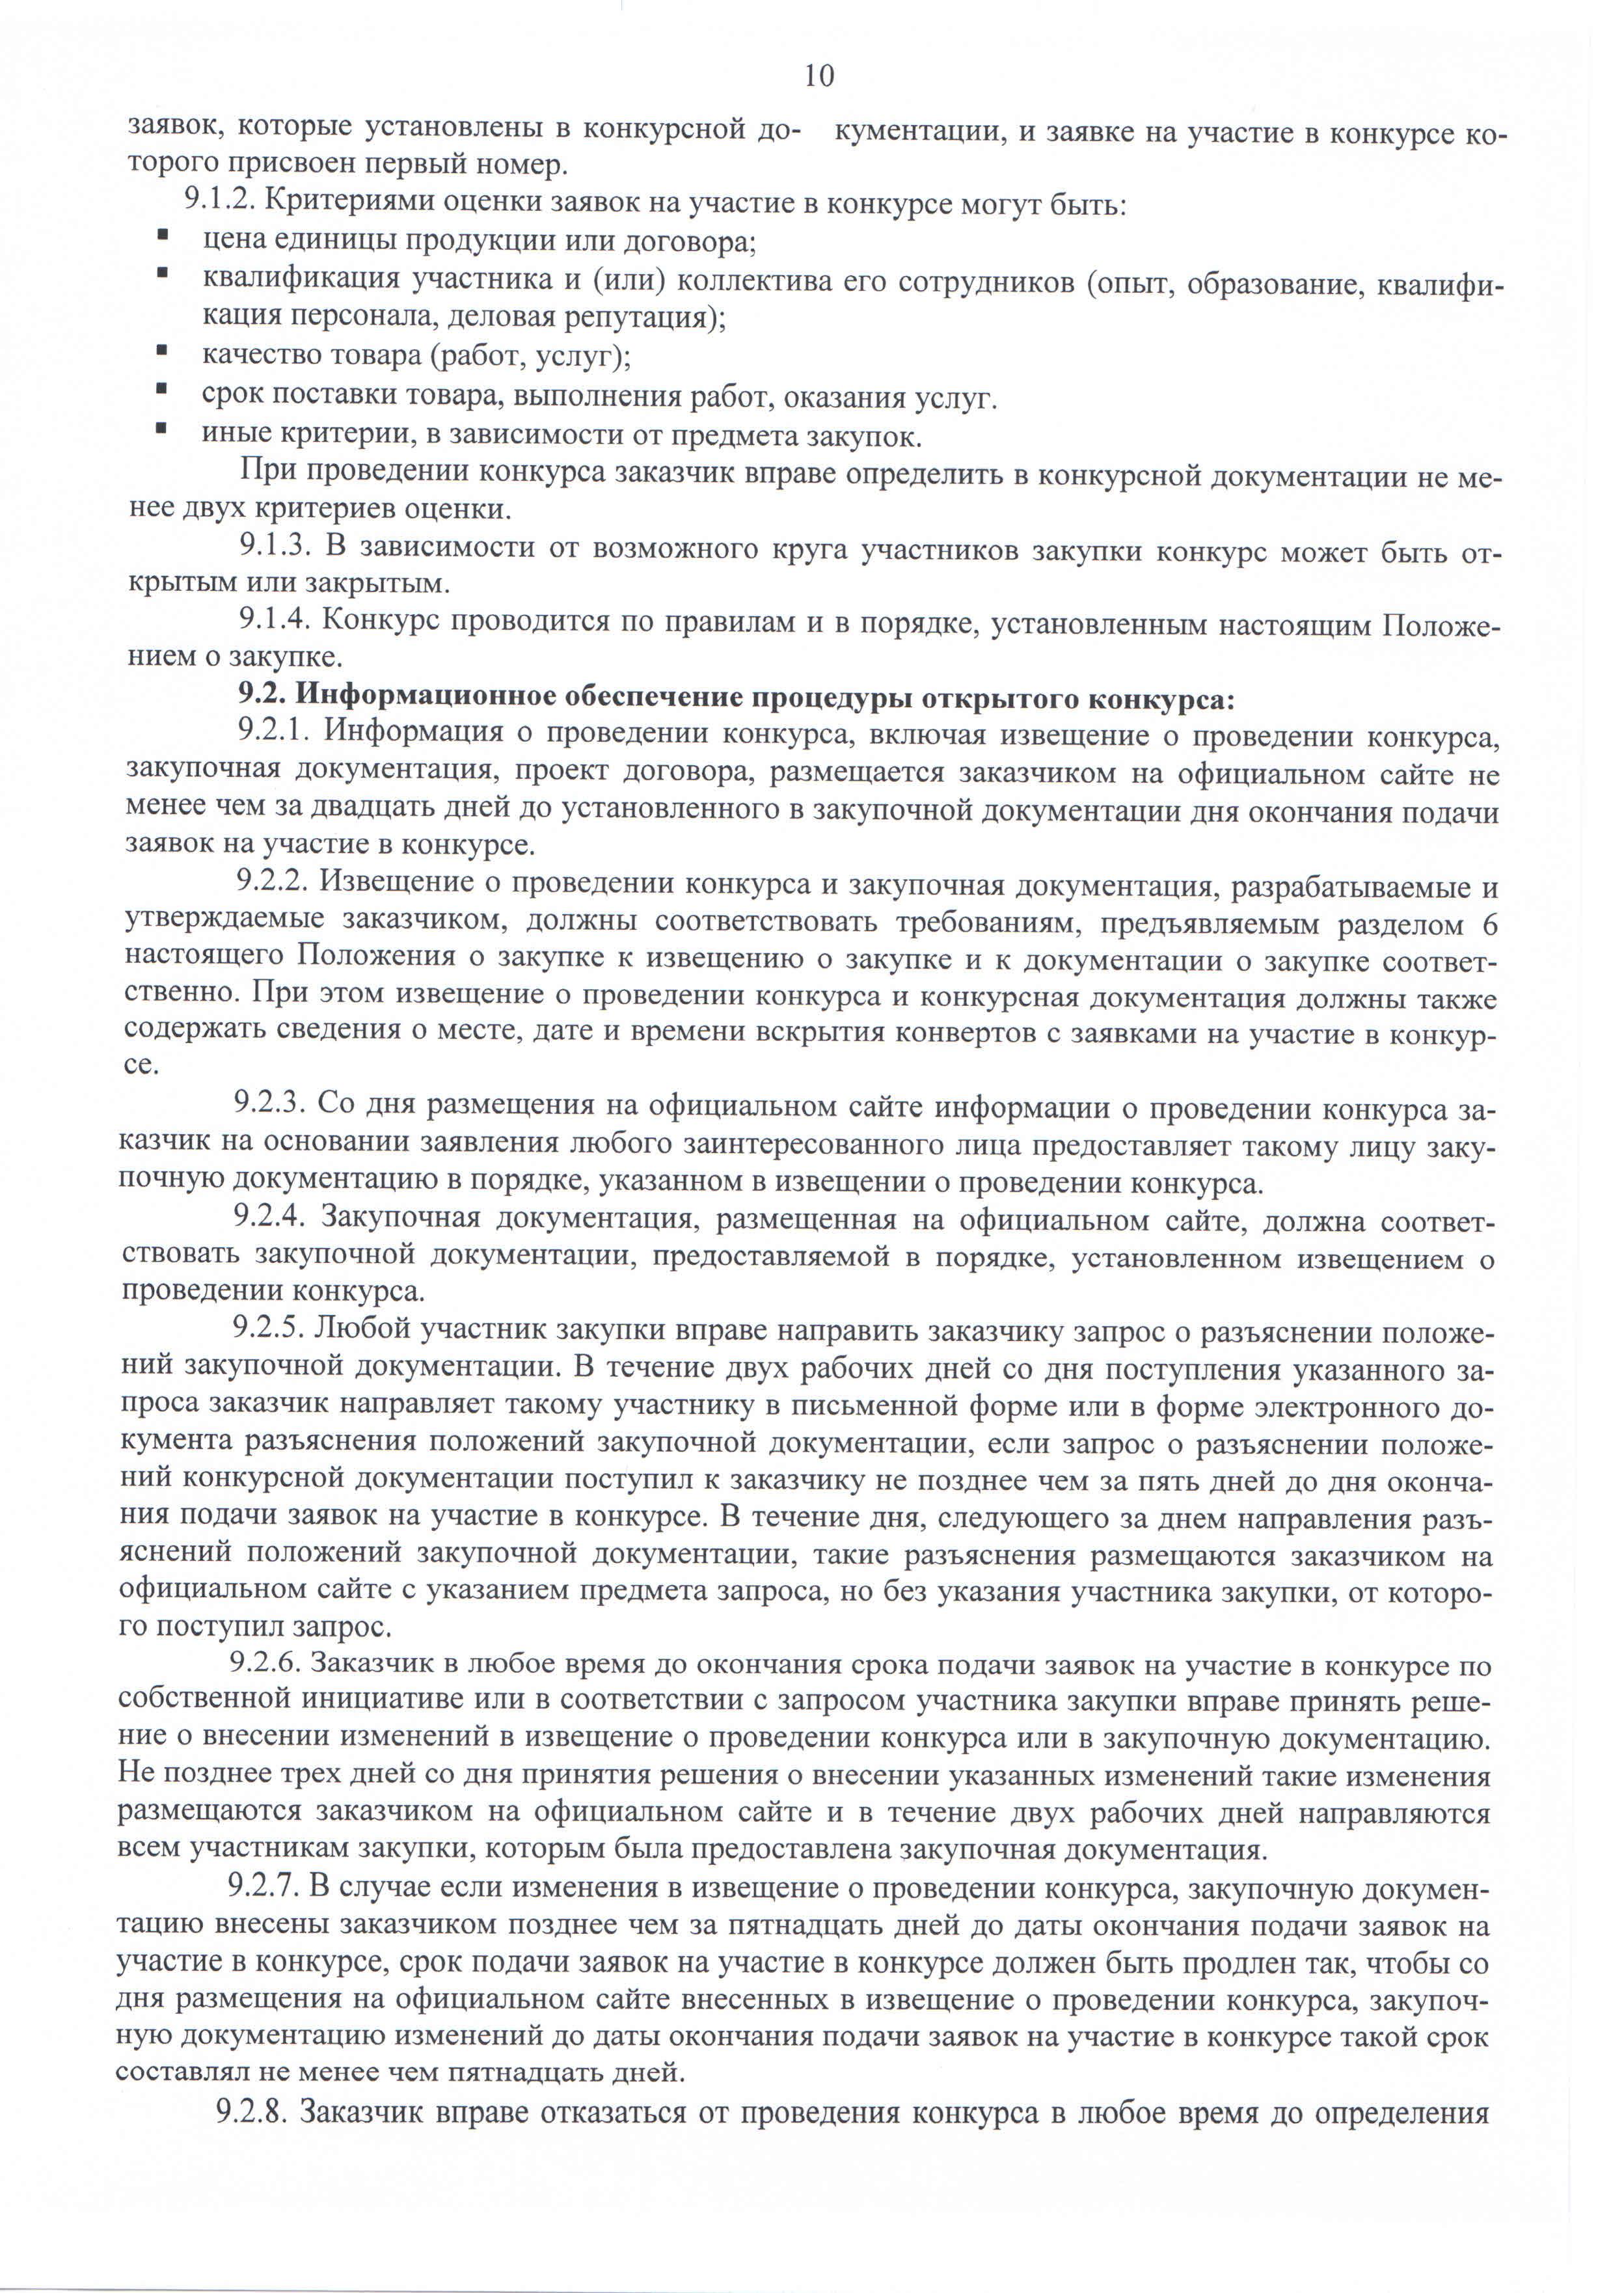 Критерии оценки заявок при открытом конкурсе